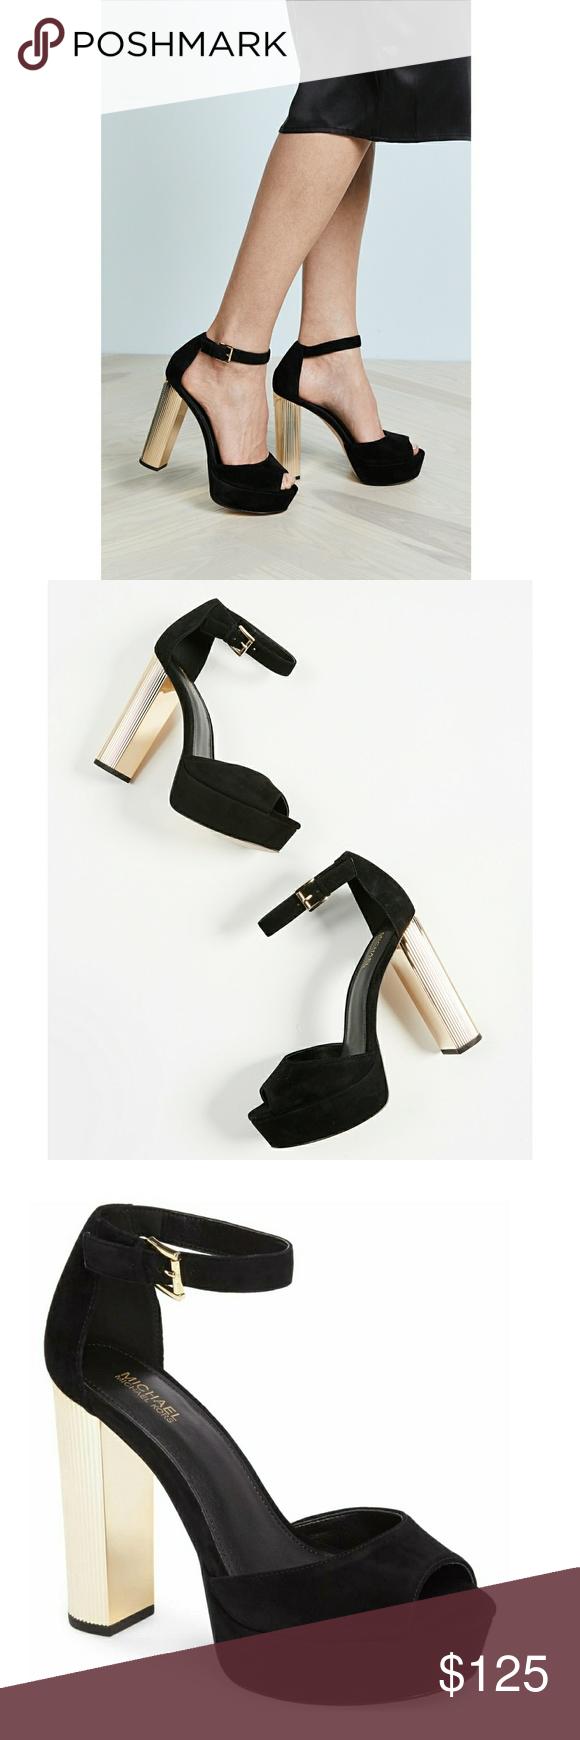 204d22c2dd39 MICHAEL KORS Paloma Platform Sandals Peep-Toe MICHAEL Michael Kors  Paloma  platform